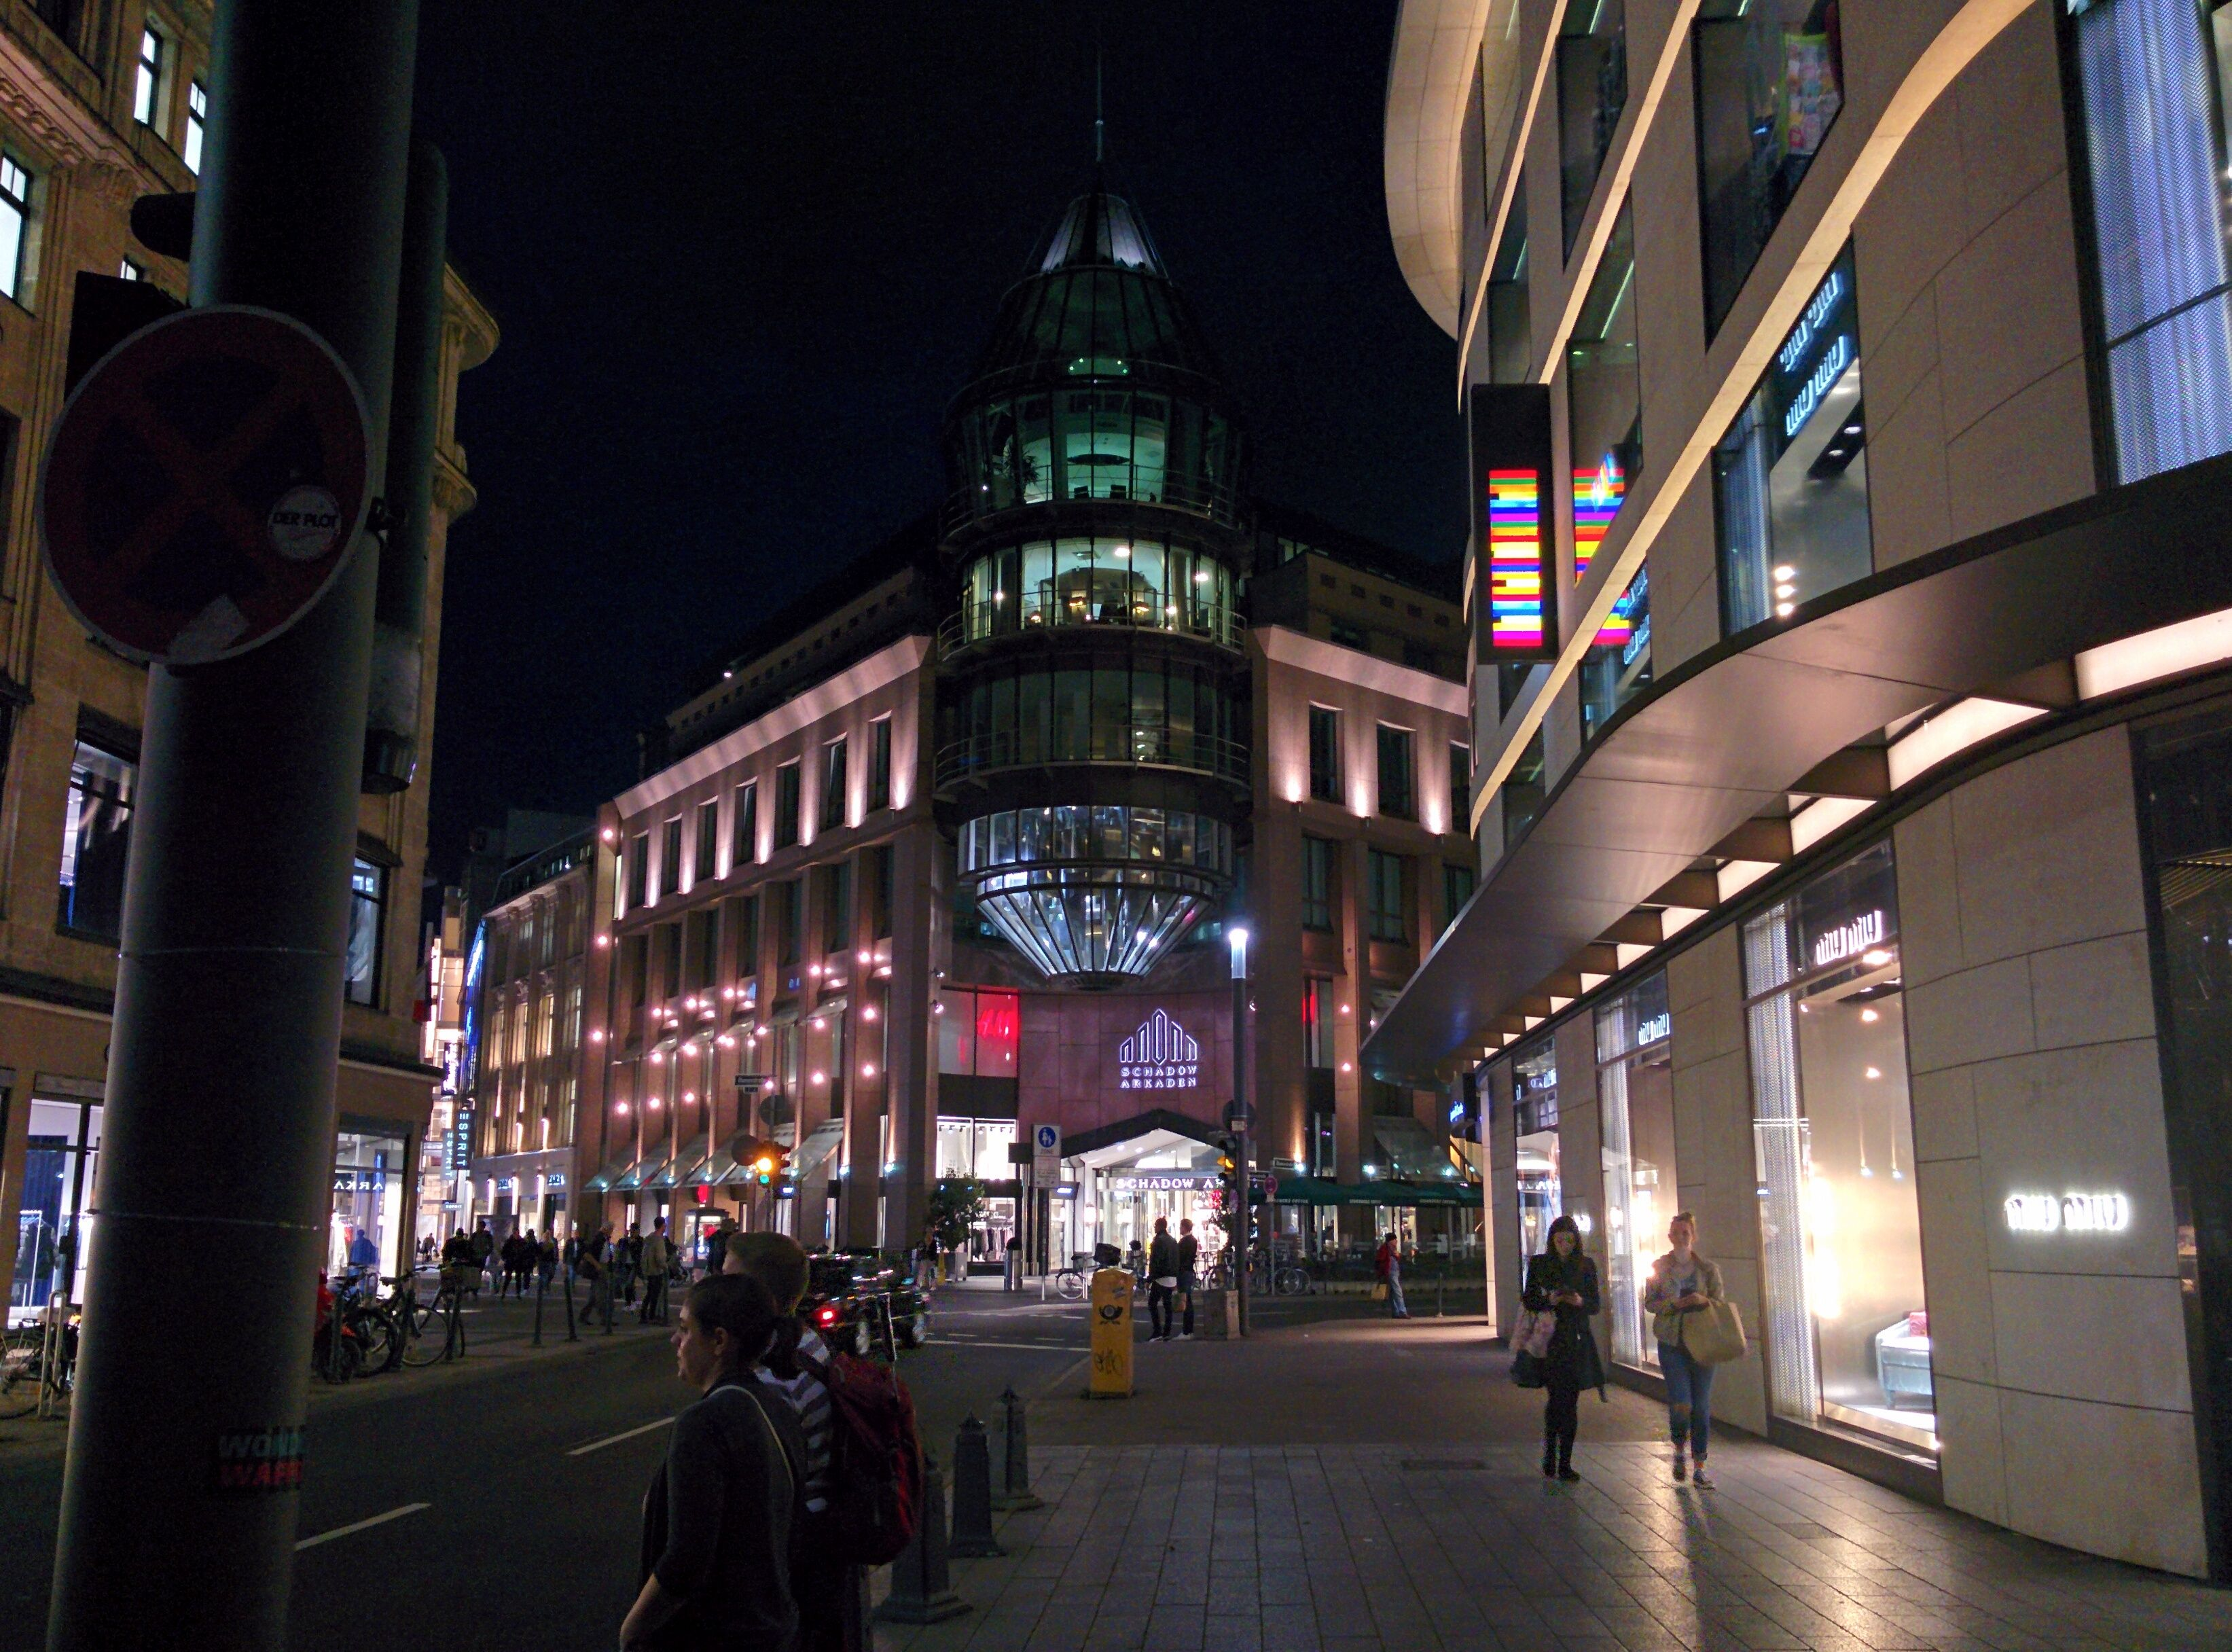 Shopping In Dusseldorf Part 2 Dusseldorf Shops And Malls In 2020 Dusseldorf Landmarks Street View